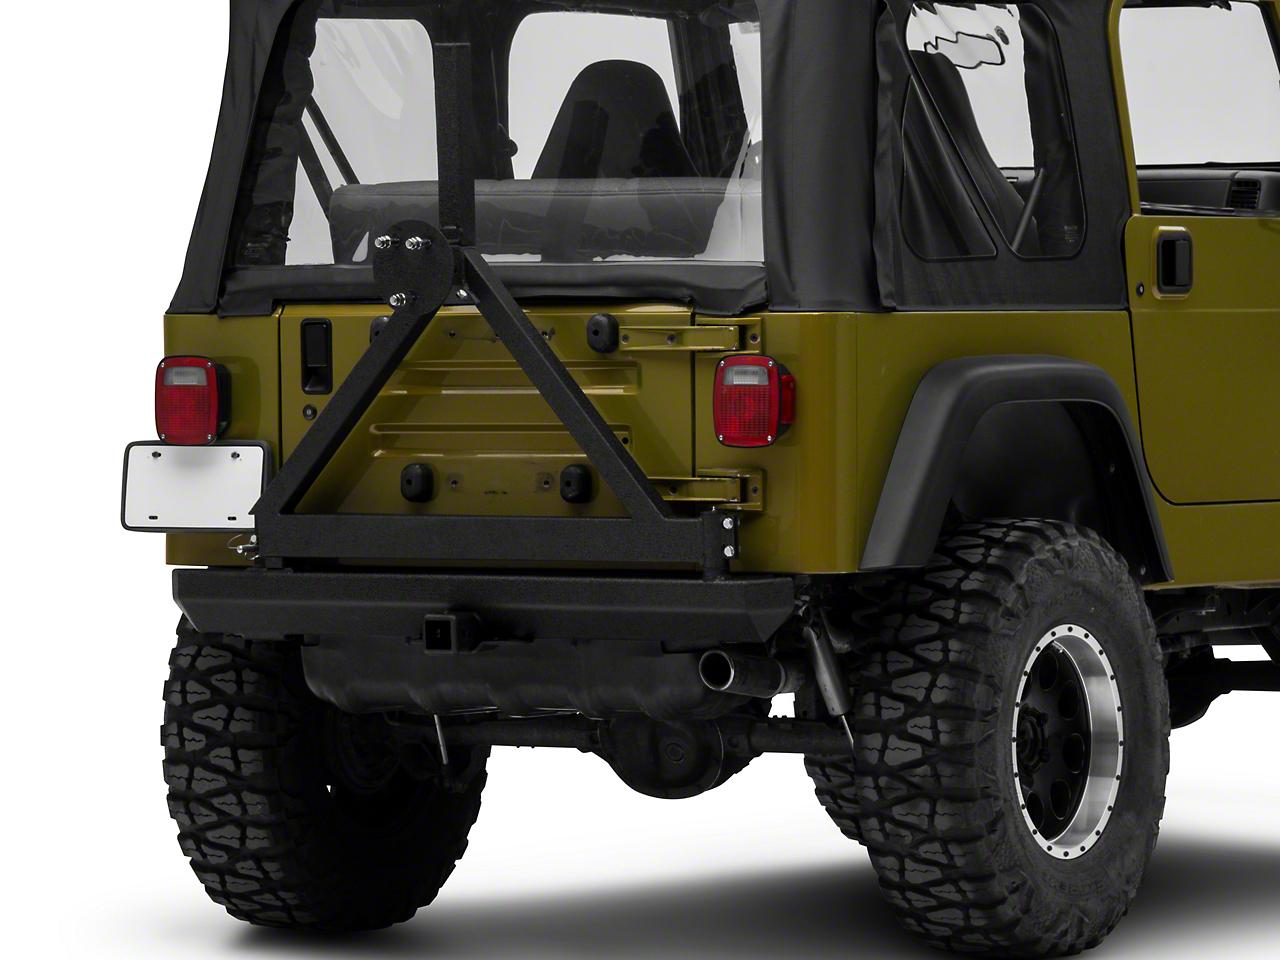 RedRock 4x4 Rock Crawler Rear Bumper w/ Tire Carrier - Textured Black (87-06 Wrangler YJ & TJ)